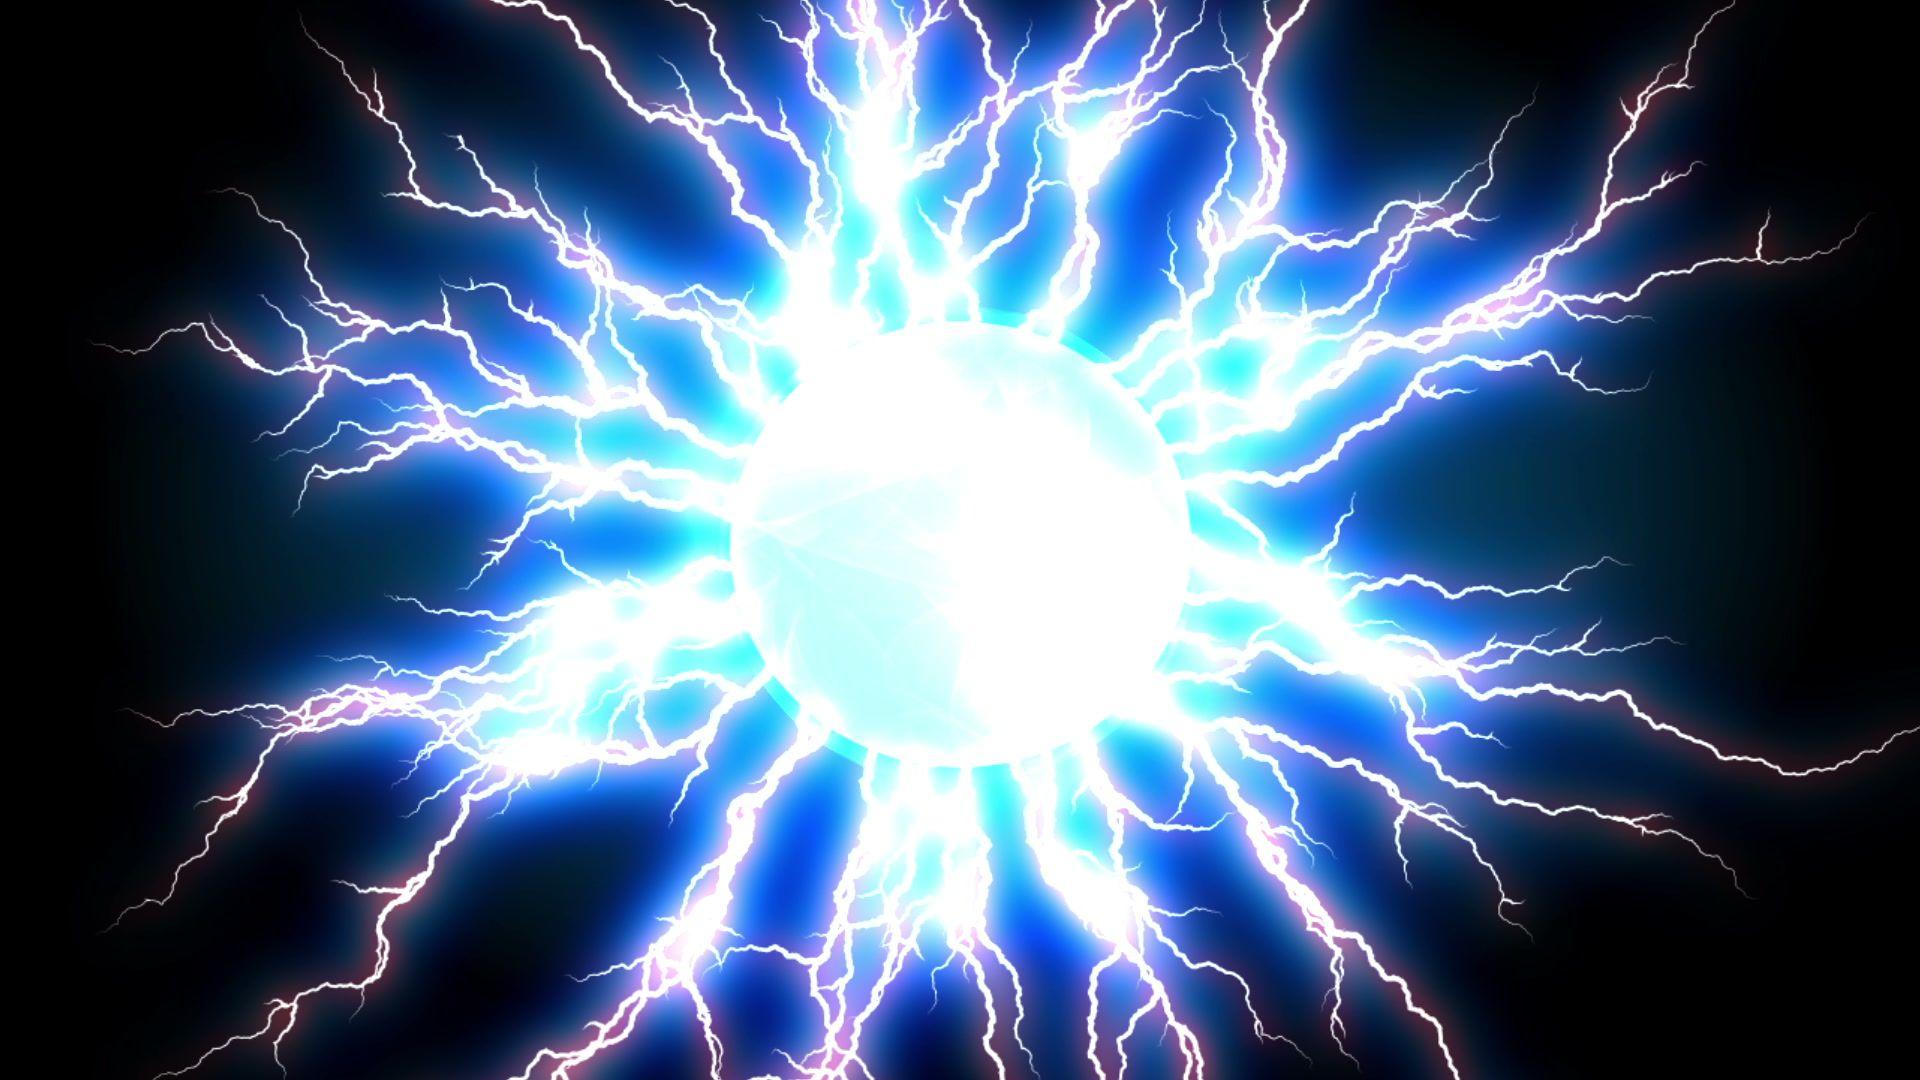 Blue Lightnings Plasma Ball Abstract Video Footage Stock Footage